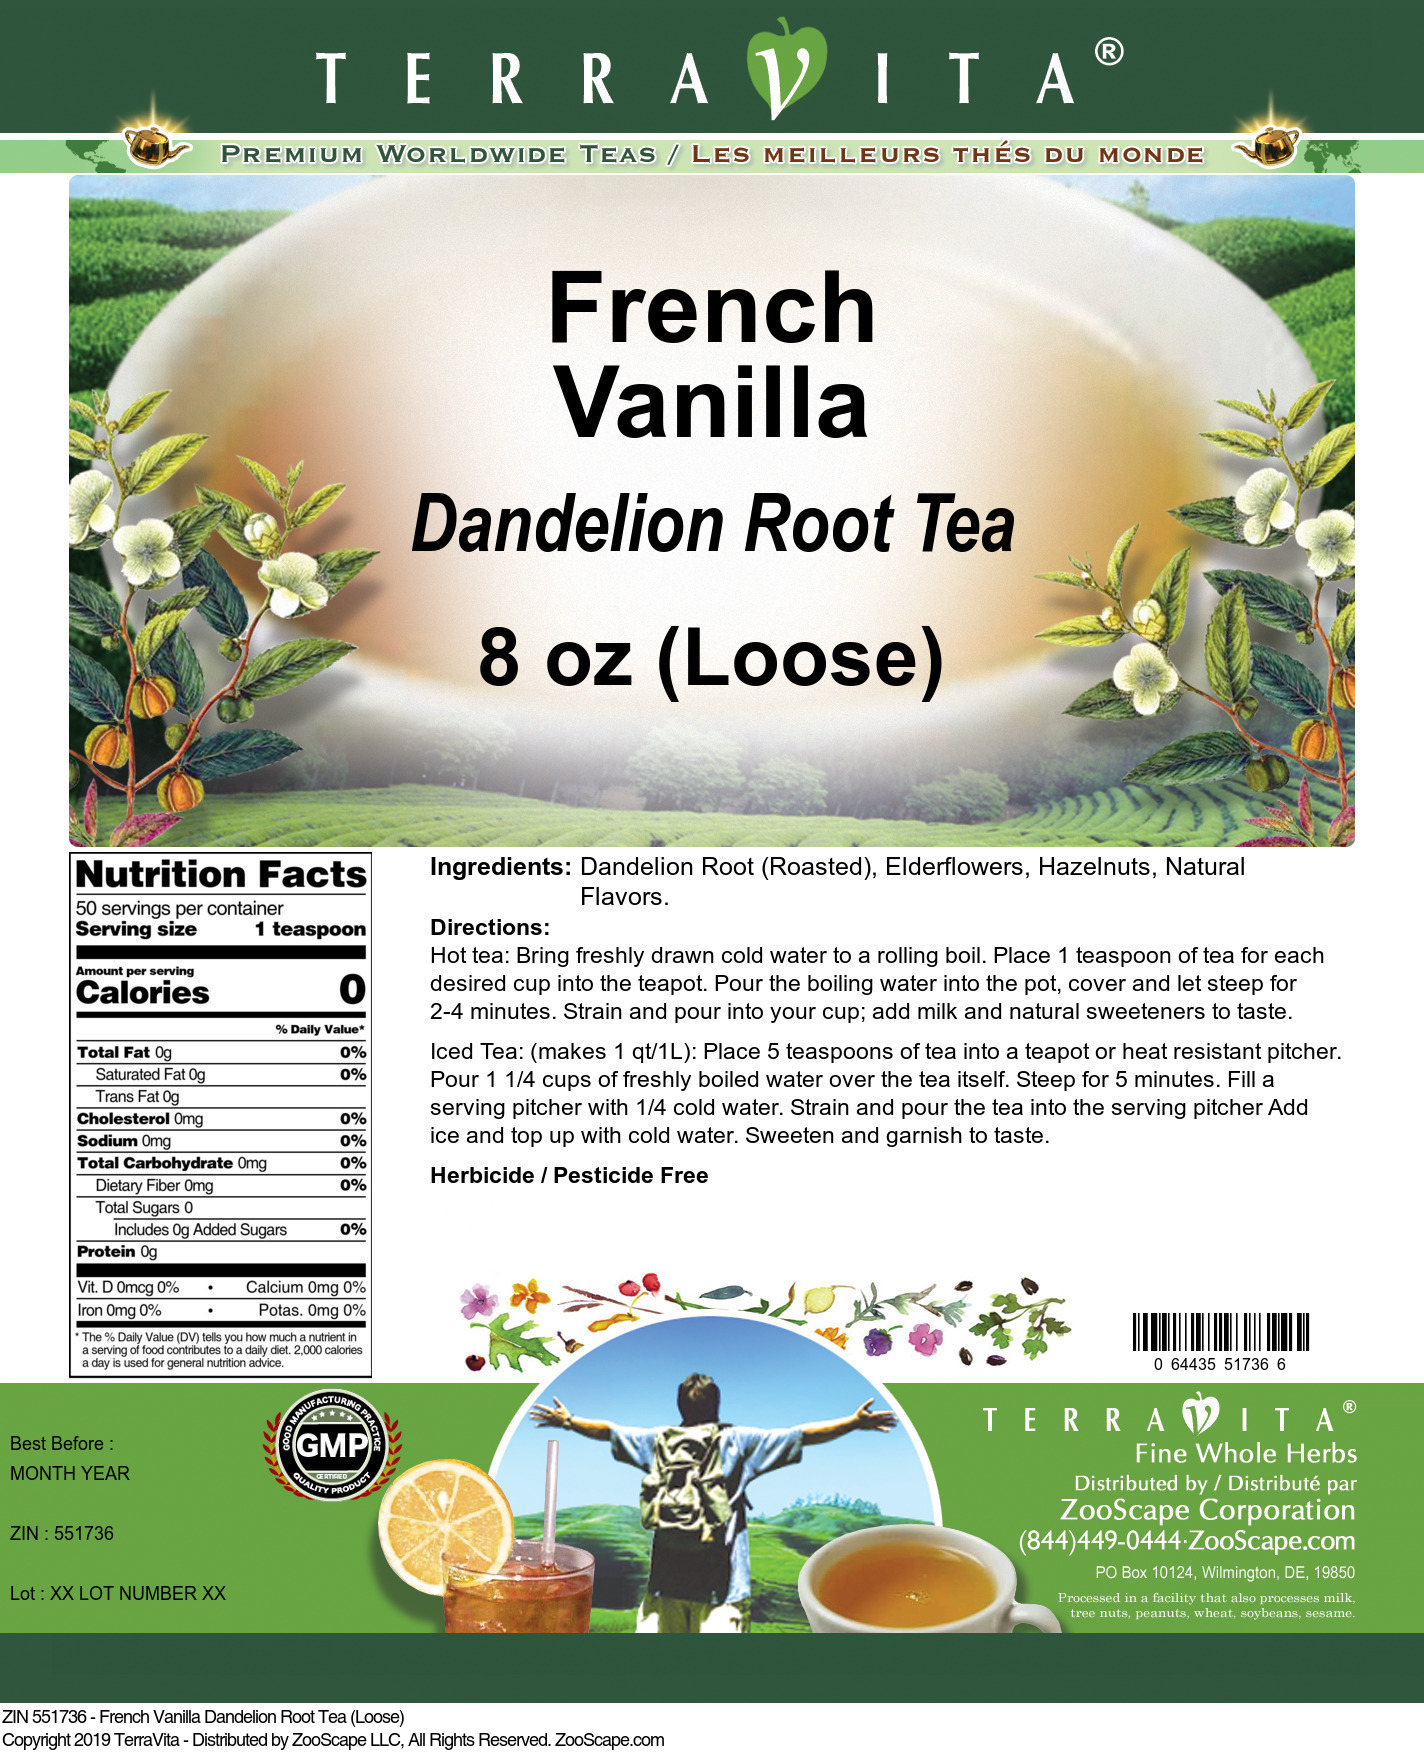 French Vanilla Dandelion Root Tea (Loose)